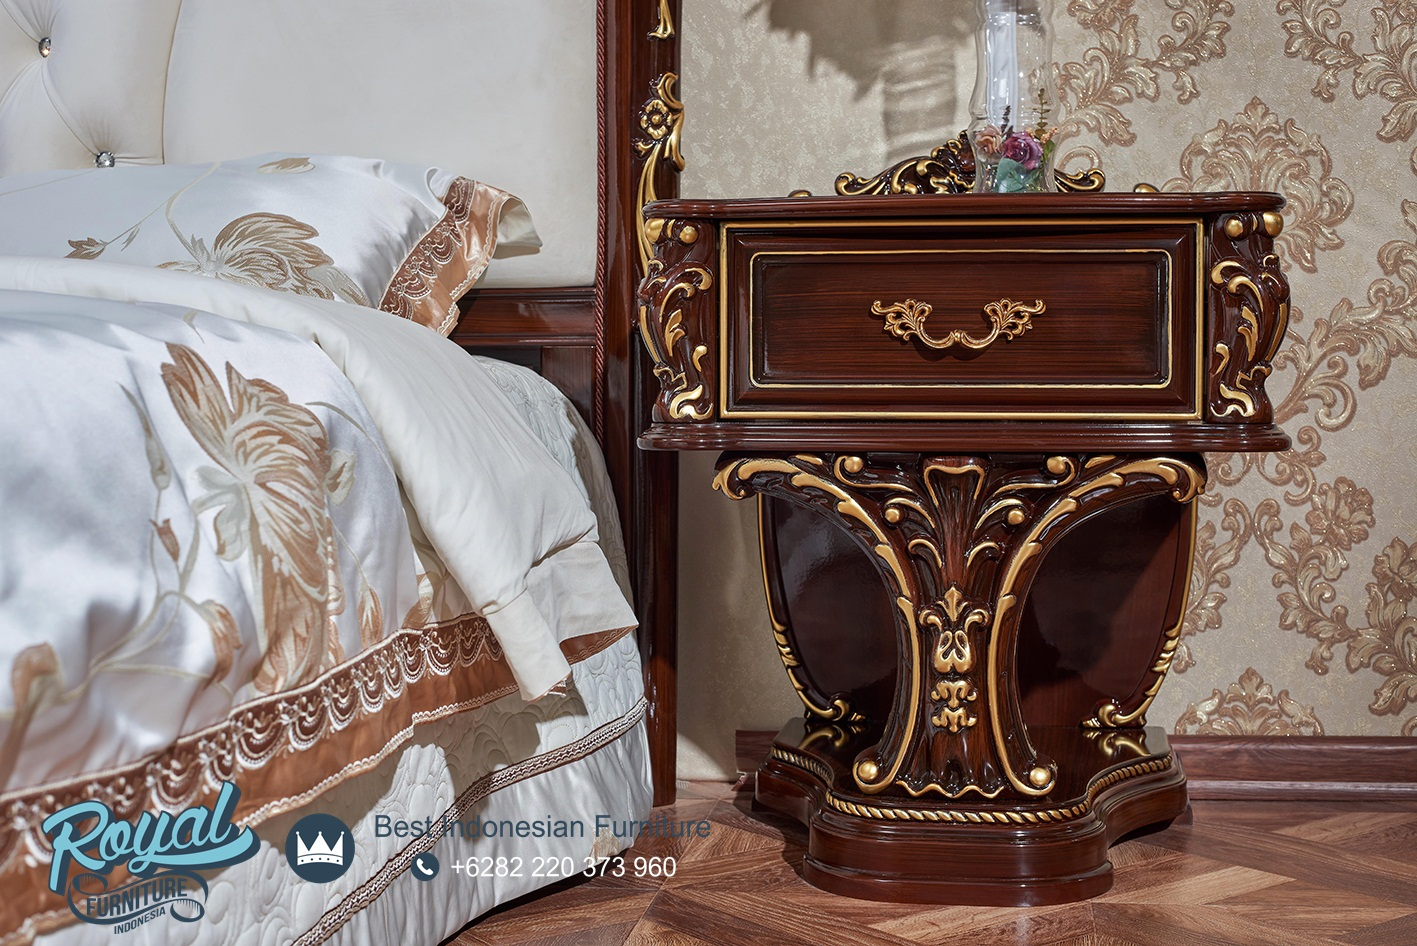 Nakas Jepara Kayu Jati Klasik Ukiran Carolina, kamar tidur mewah modern terbaru, kamar tidur mewah dan elegan, kamar tidur mewah elegan, kamar tidur mewah klasik, kamar tidur mewah minimalis, set kamar tidur mewah, set kamar tidur mewah klasik, harga tempat tidur mewah modern, kamar set minimalis mewah, tempat tidur mewah gold duco, tempat tidur mewah ukir jepara, model kamar set pengantin terbaru, harga 1 set tempat tidur pengantin, tempat tidur jati jepara, kamar set jati jepara, mebel jepara, furniture jepara, toko furniture jepara, royal furniture